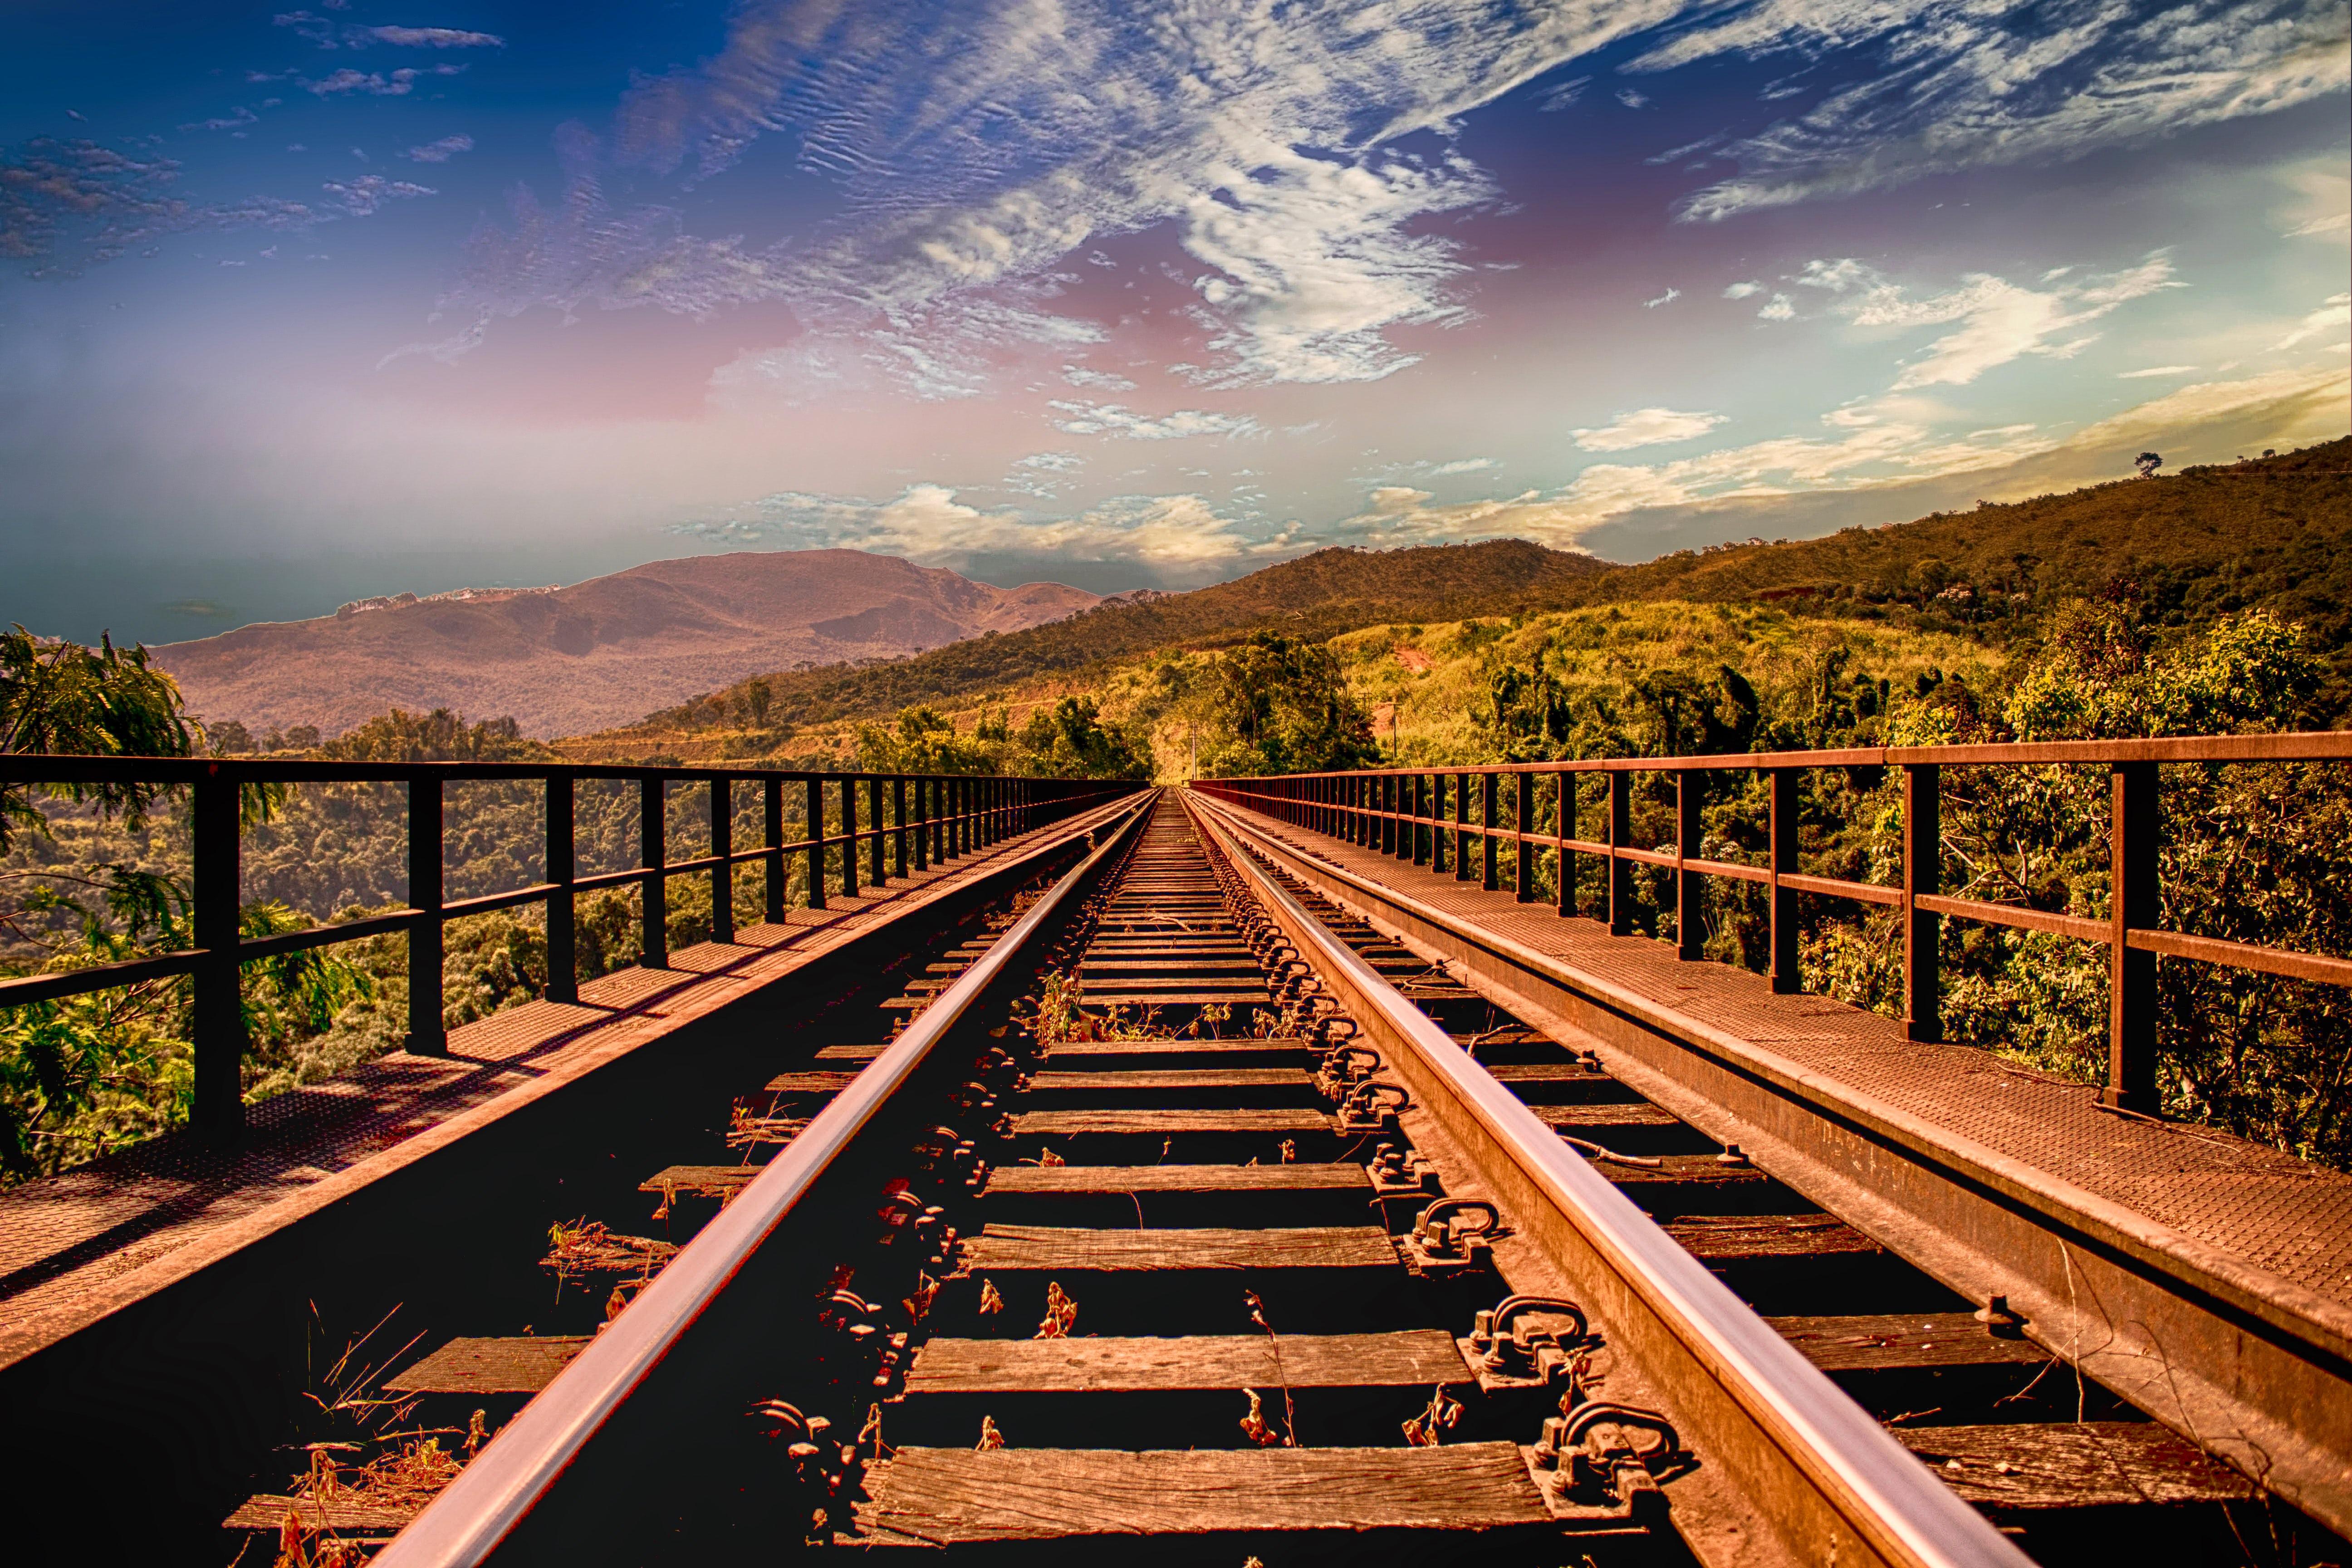 Travelling Turkey By Train- Kurtalan Express